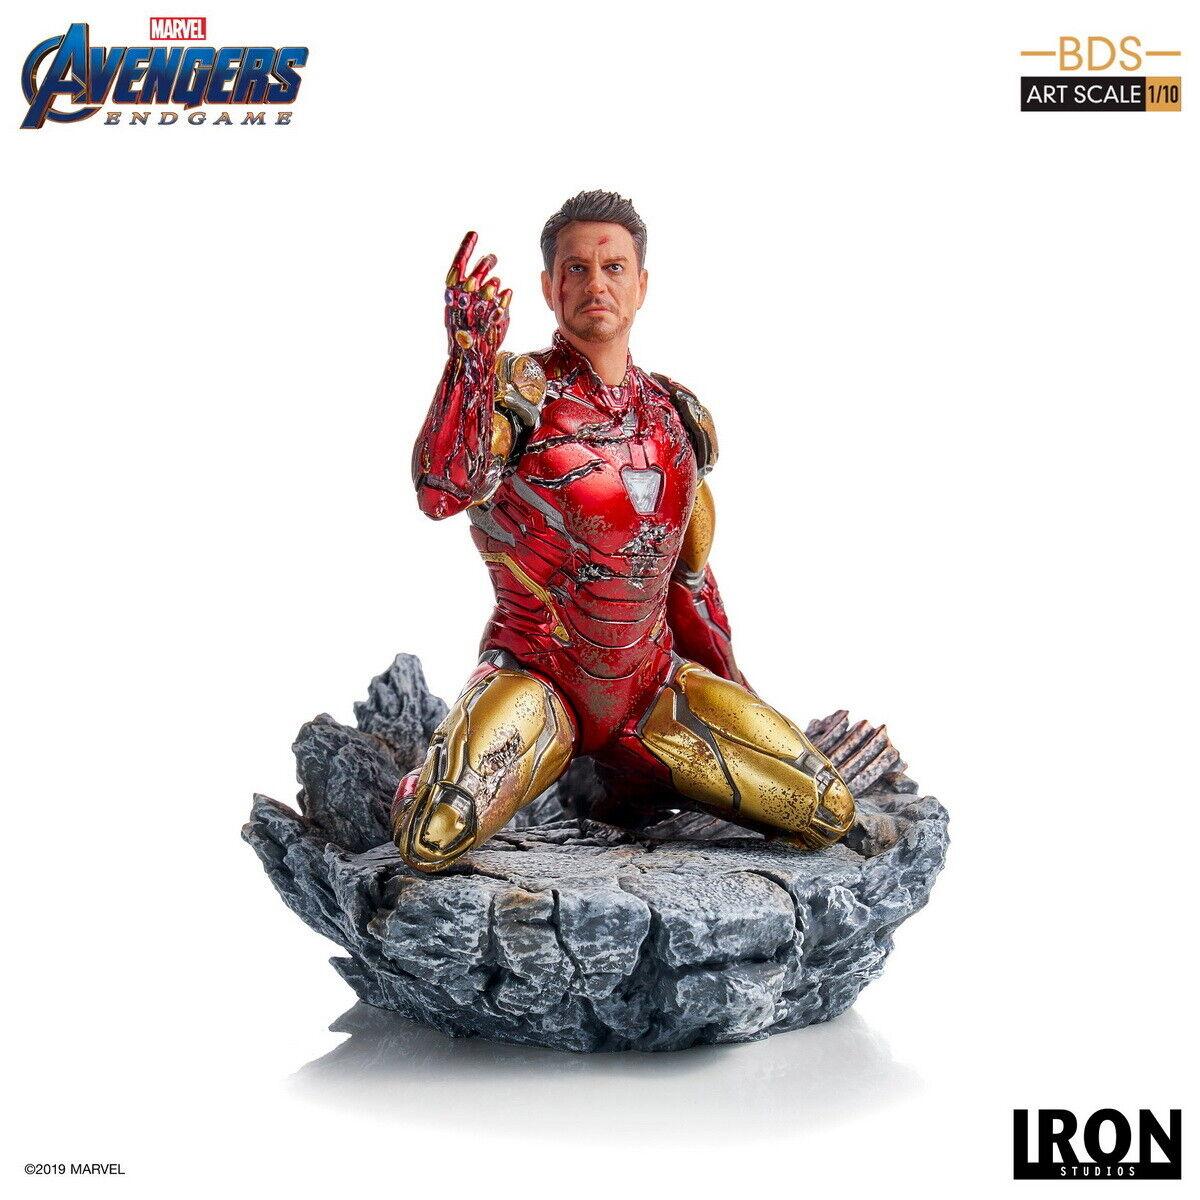 Iron Studios Avengers: Endgame I am Iron Man MARK 85 Tony Stark BDS 1/10 Statue on eBay thumbnail